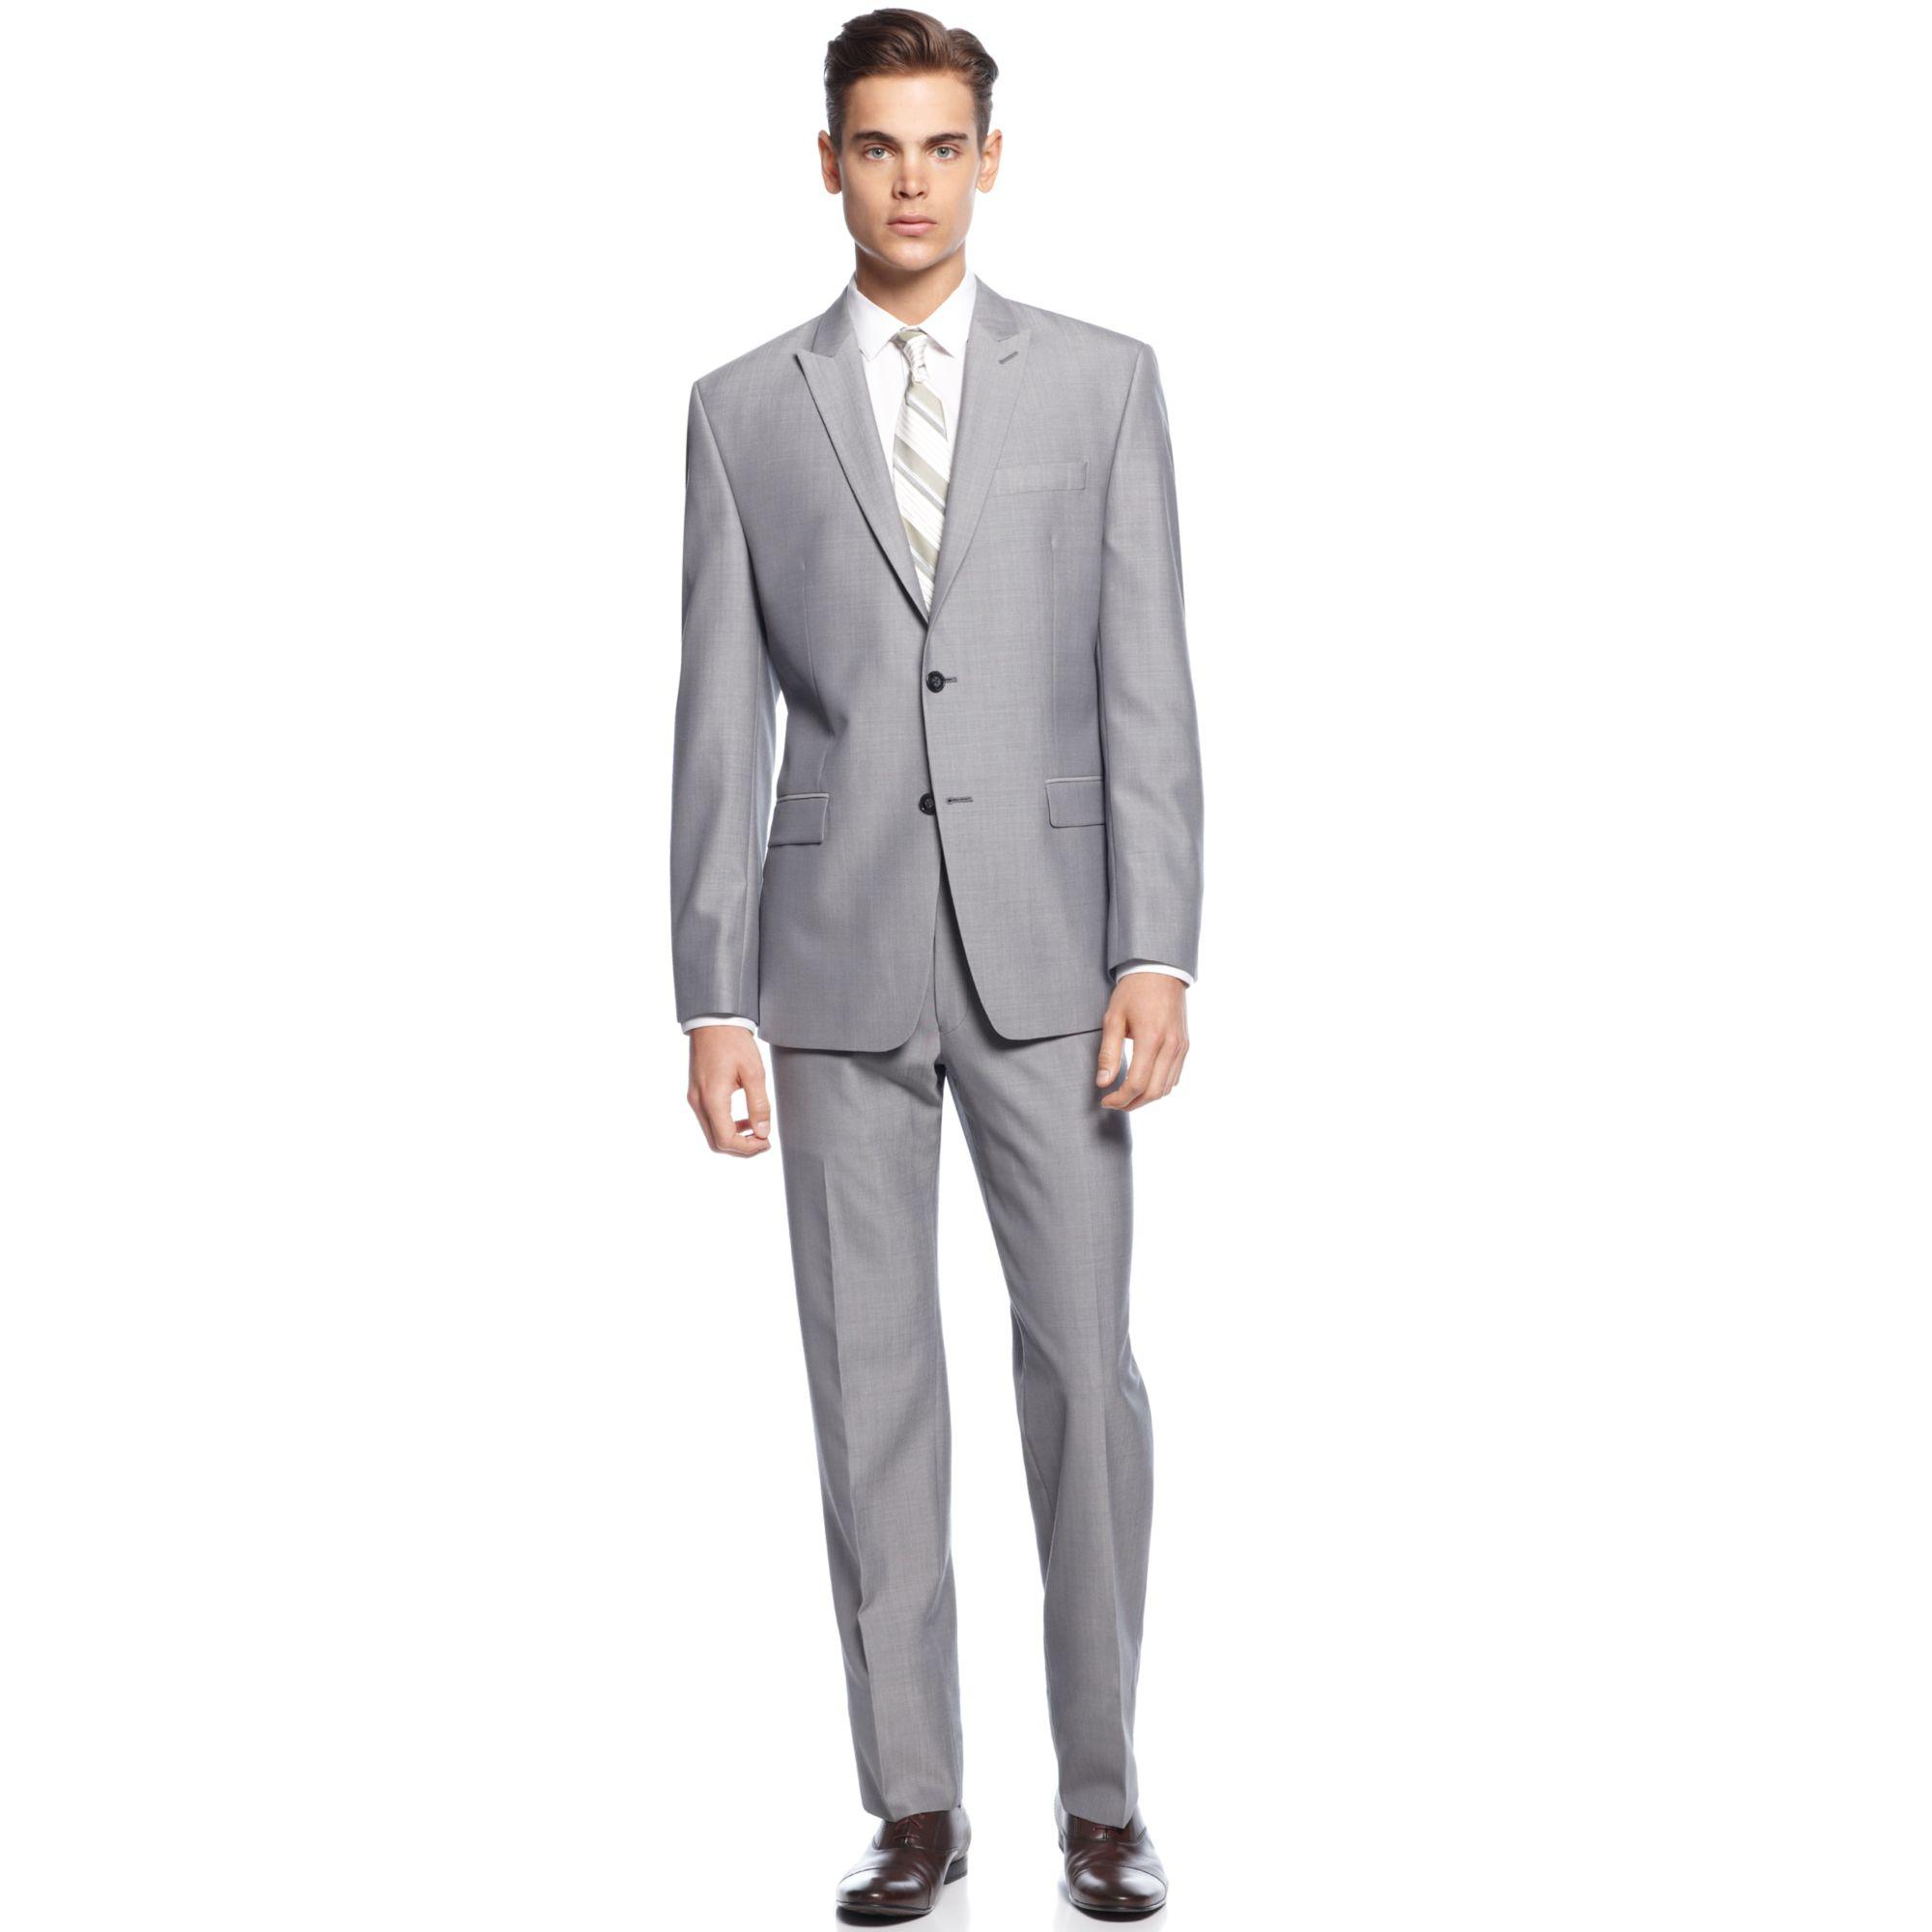 calvin klein light grey peak lapel slim fit suit in gray for men grey lyst. Black Bedroom Furniture Sets. Home Design Ideas